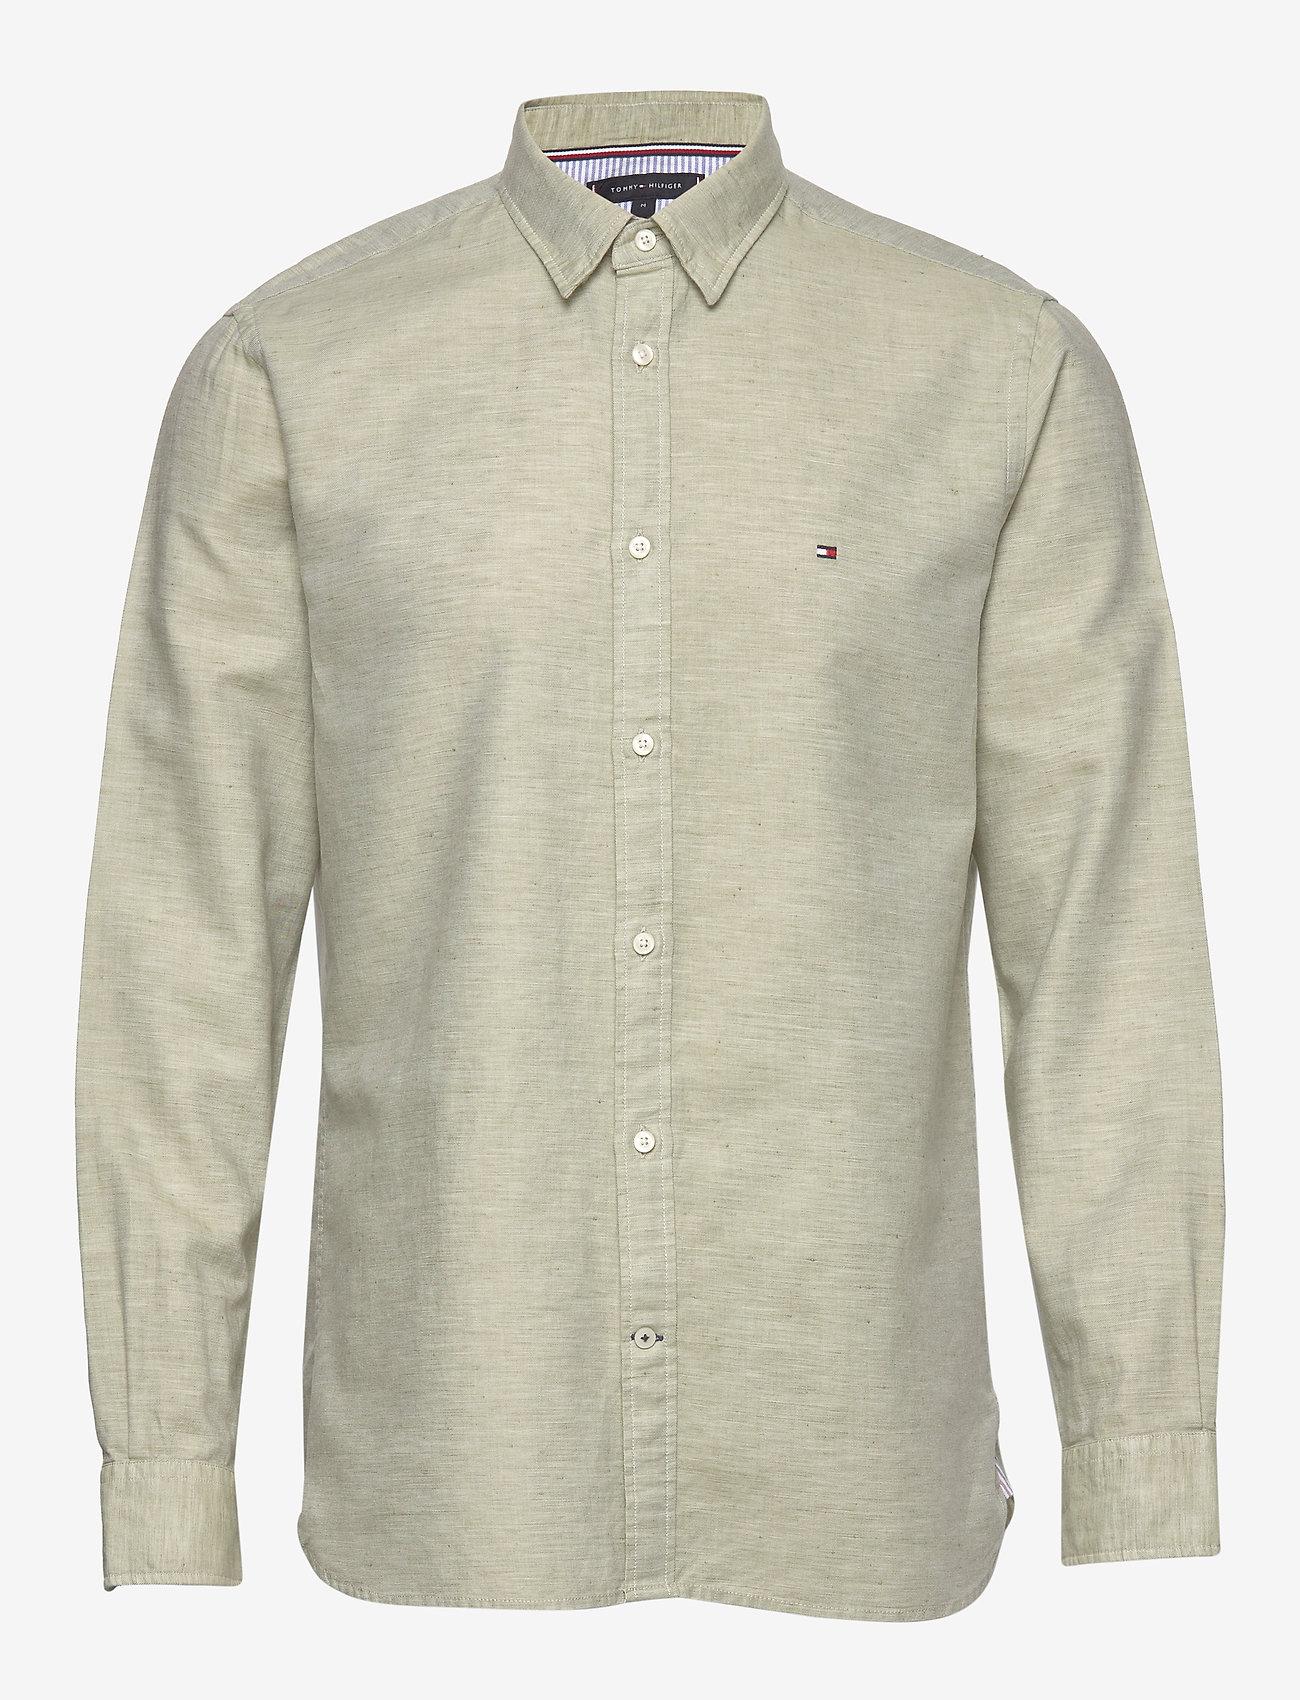 Tommy Hilfiger - COTTON LINEN TWILL SHIRT - basic shirts - faded olive - 0